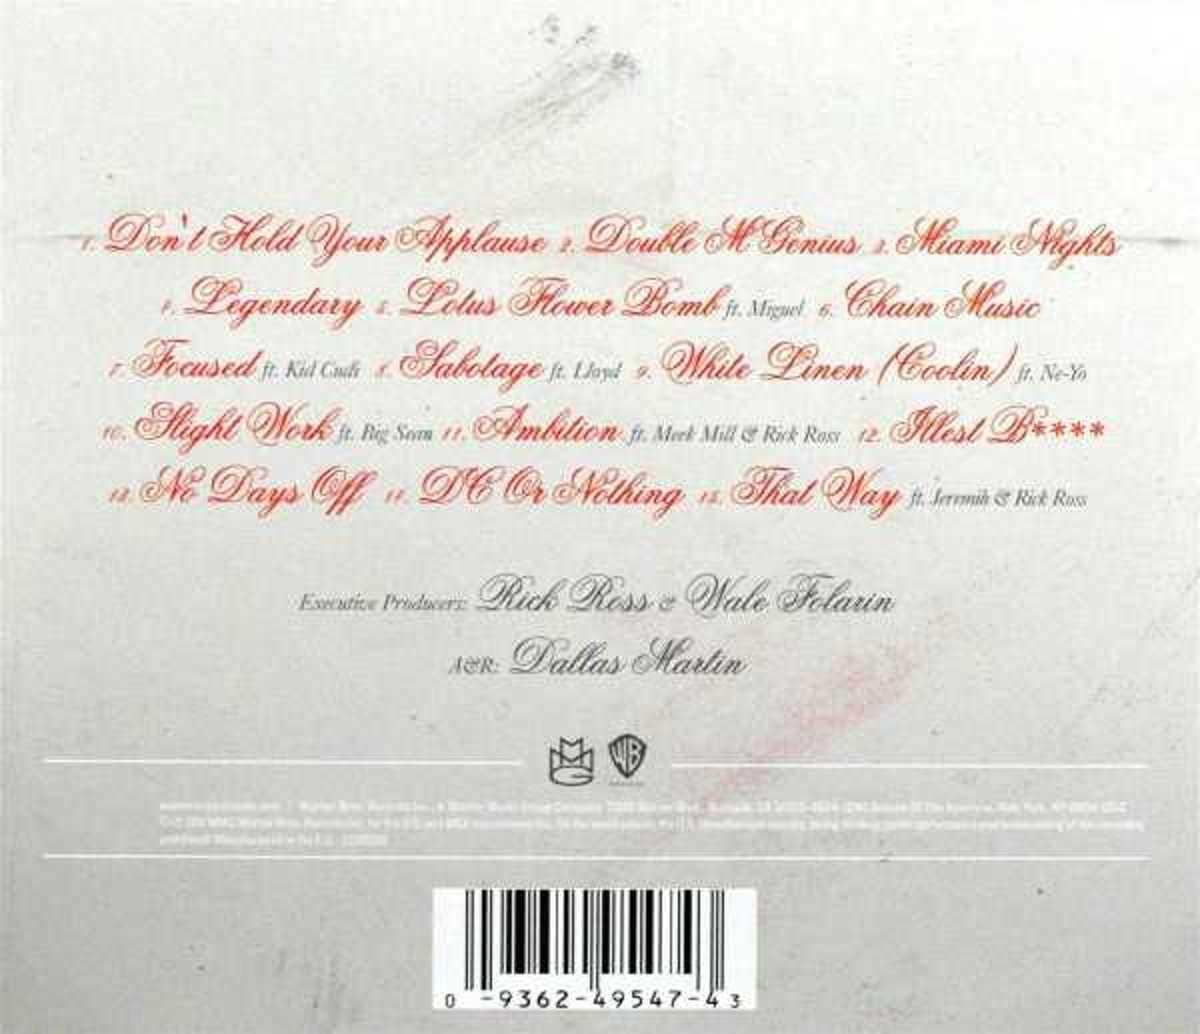 Bol Ambition Wale Cd Album Muziek